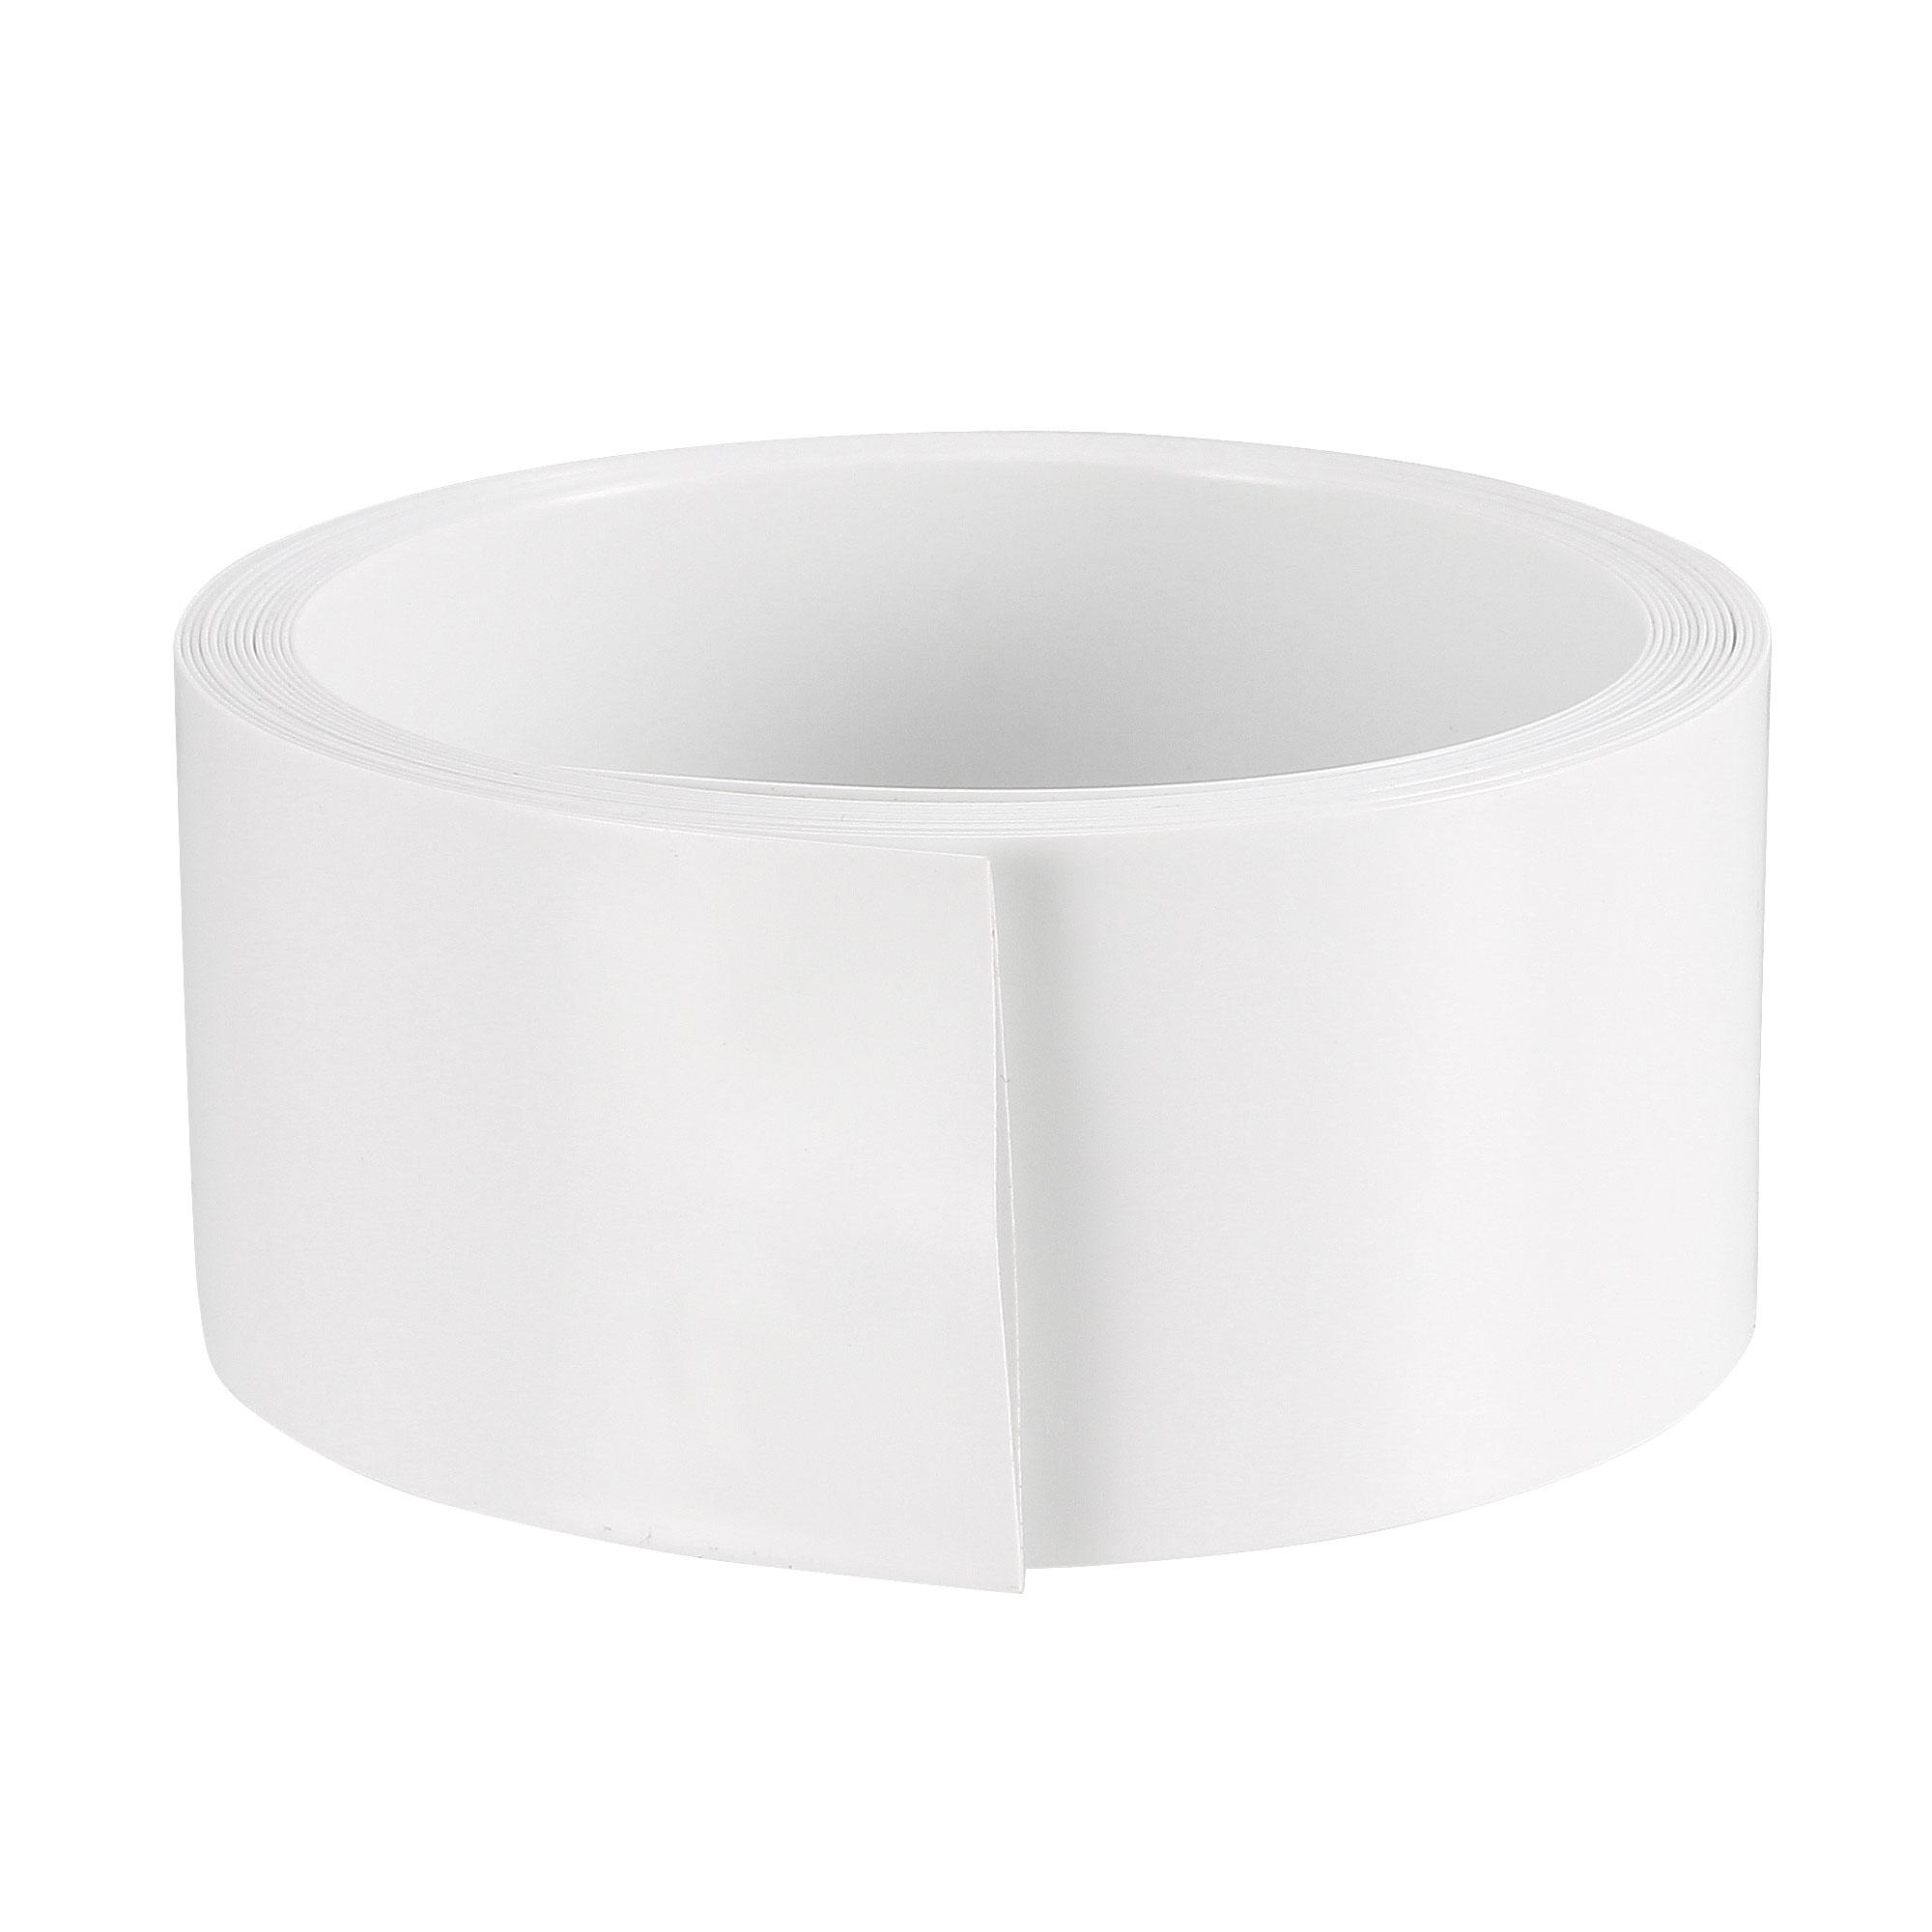 PVC Heat Shrink Tube 23mm Flat Width for AA 2 Meters Length White